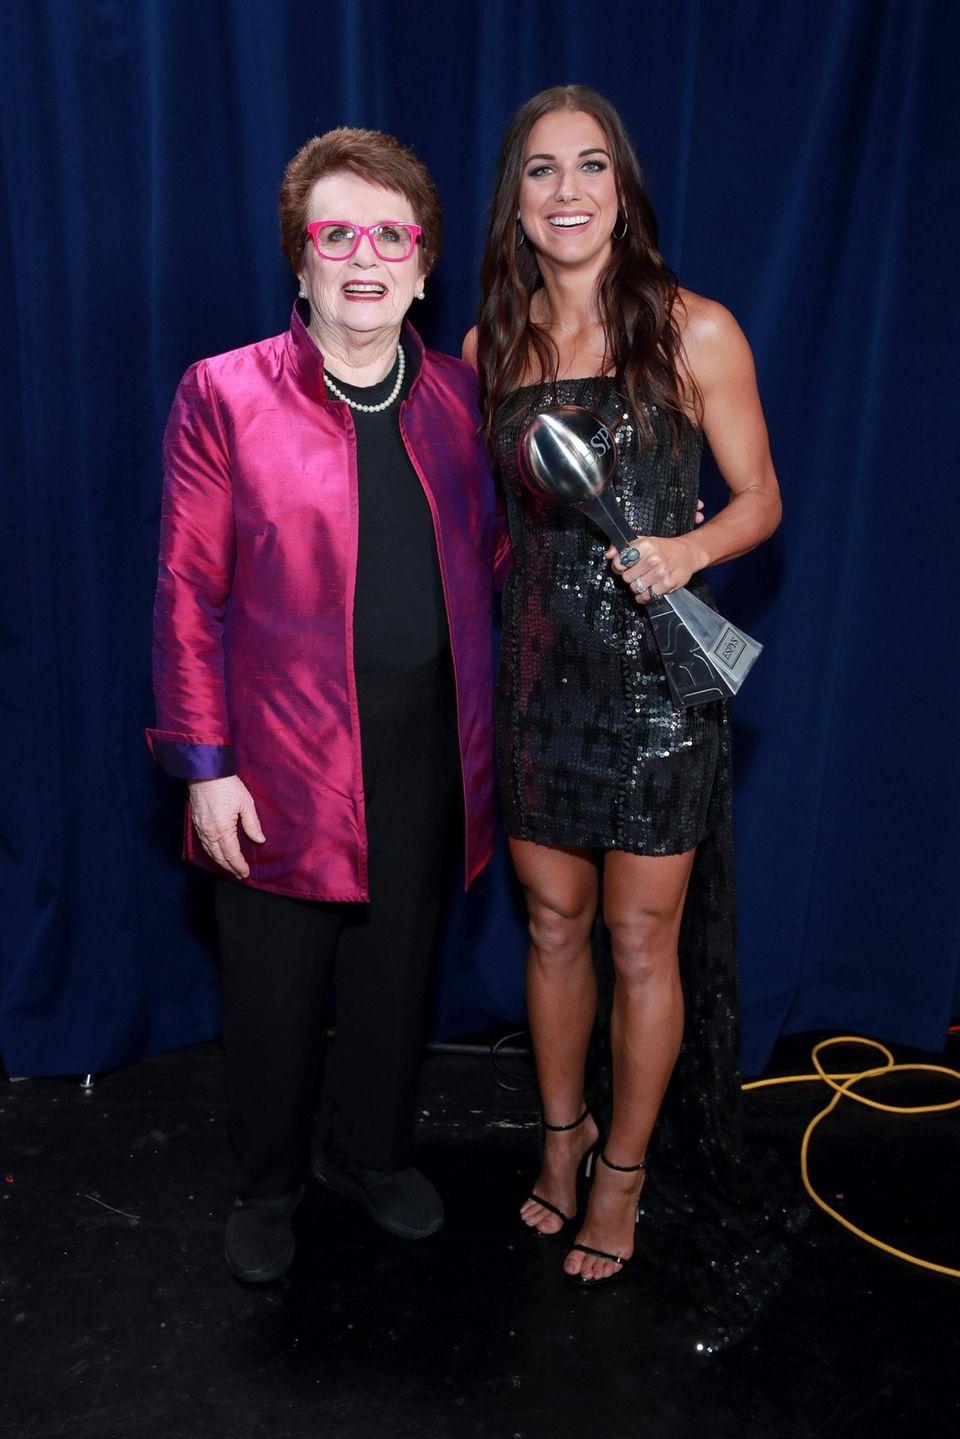 Billie Jean King and Best Female Athlete ESPY